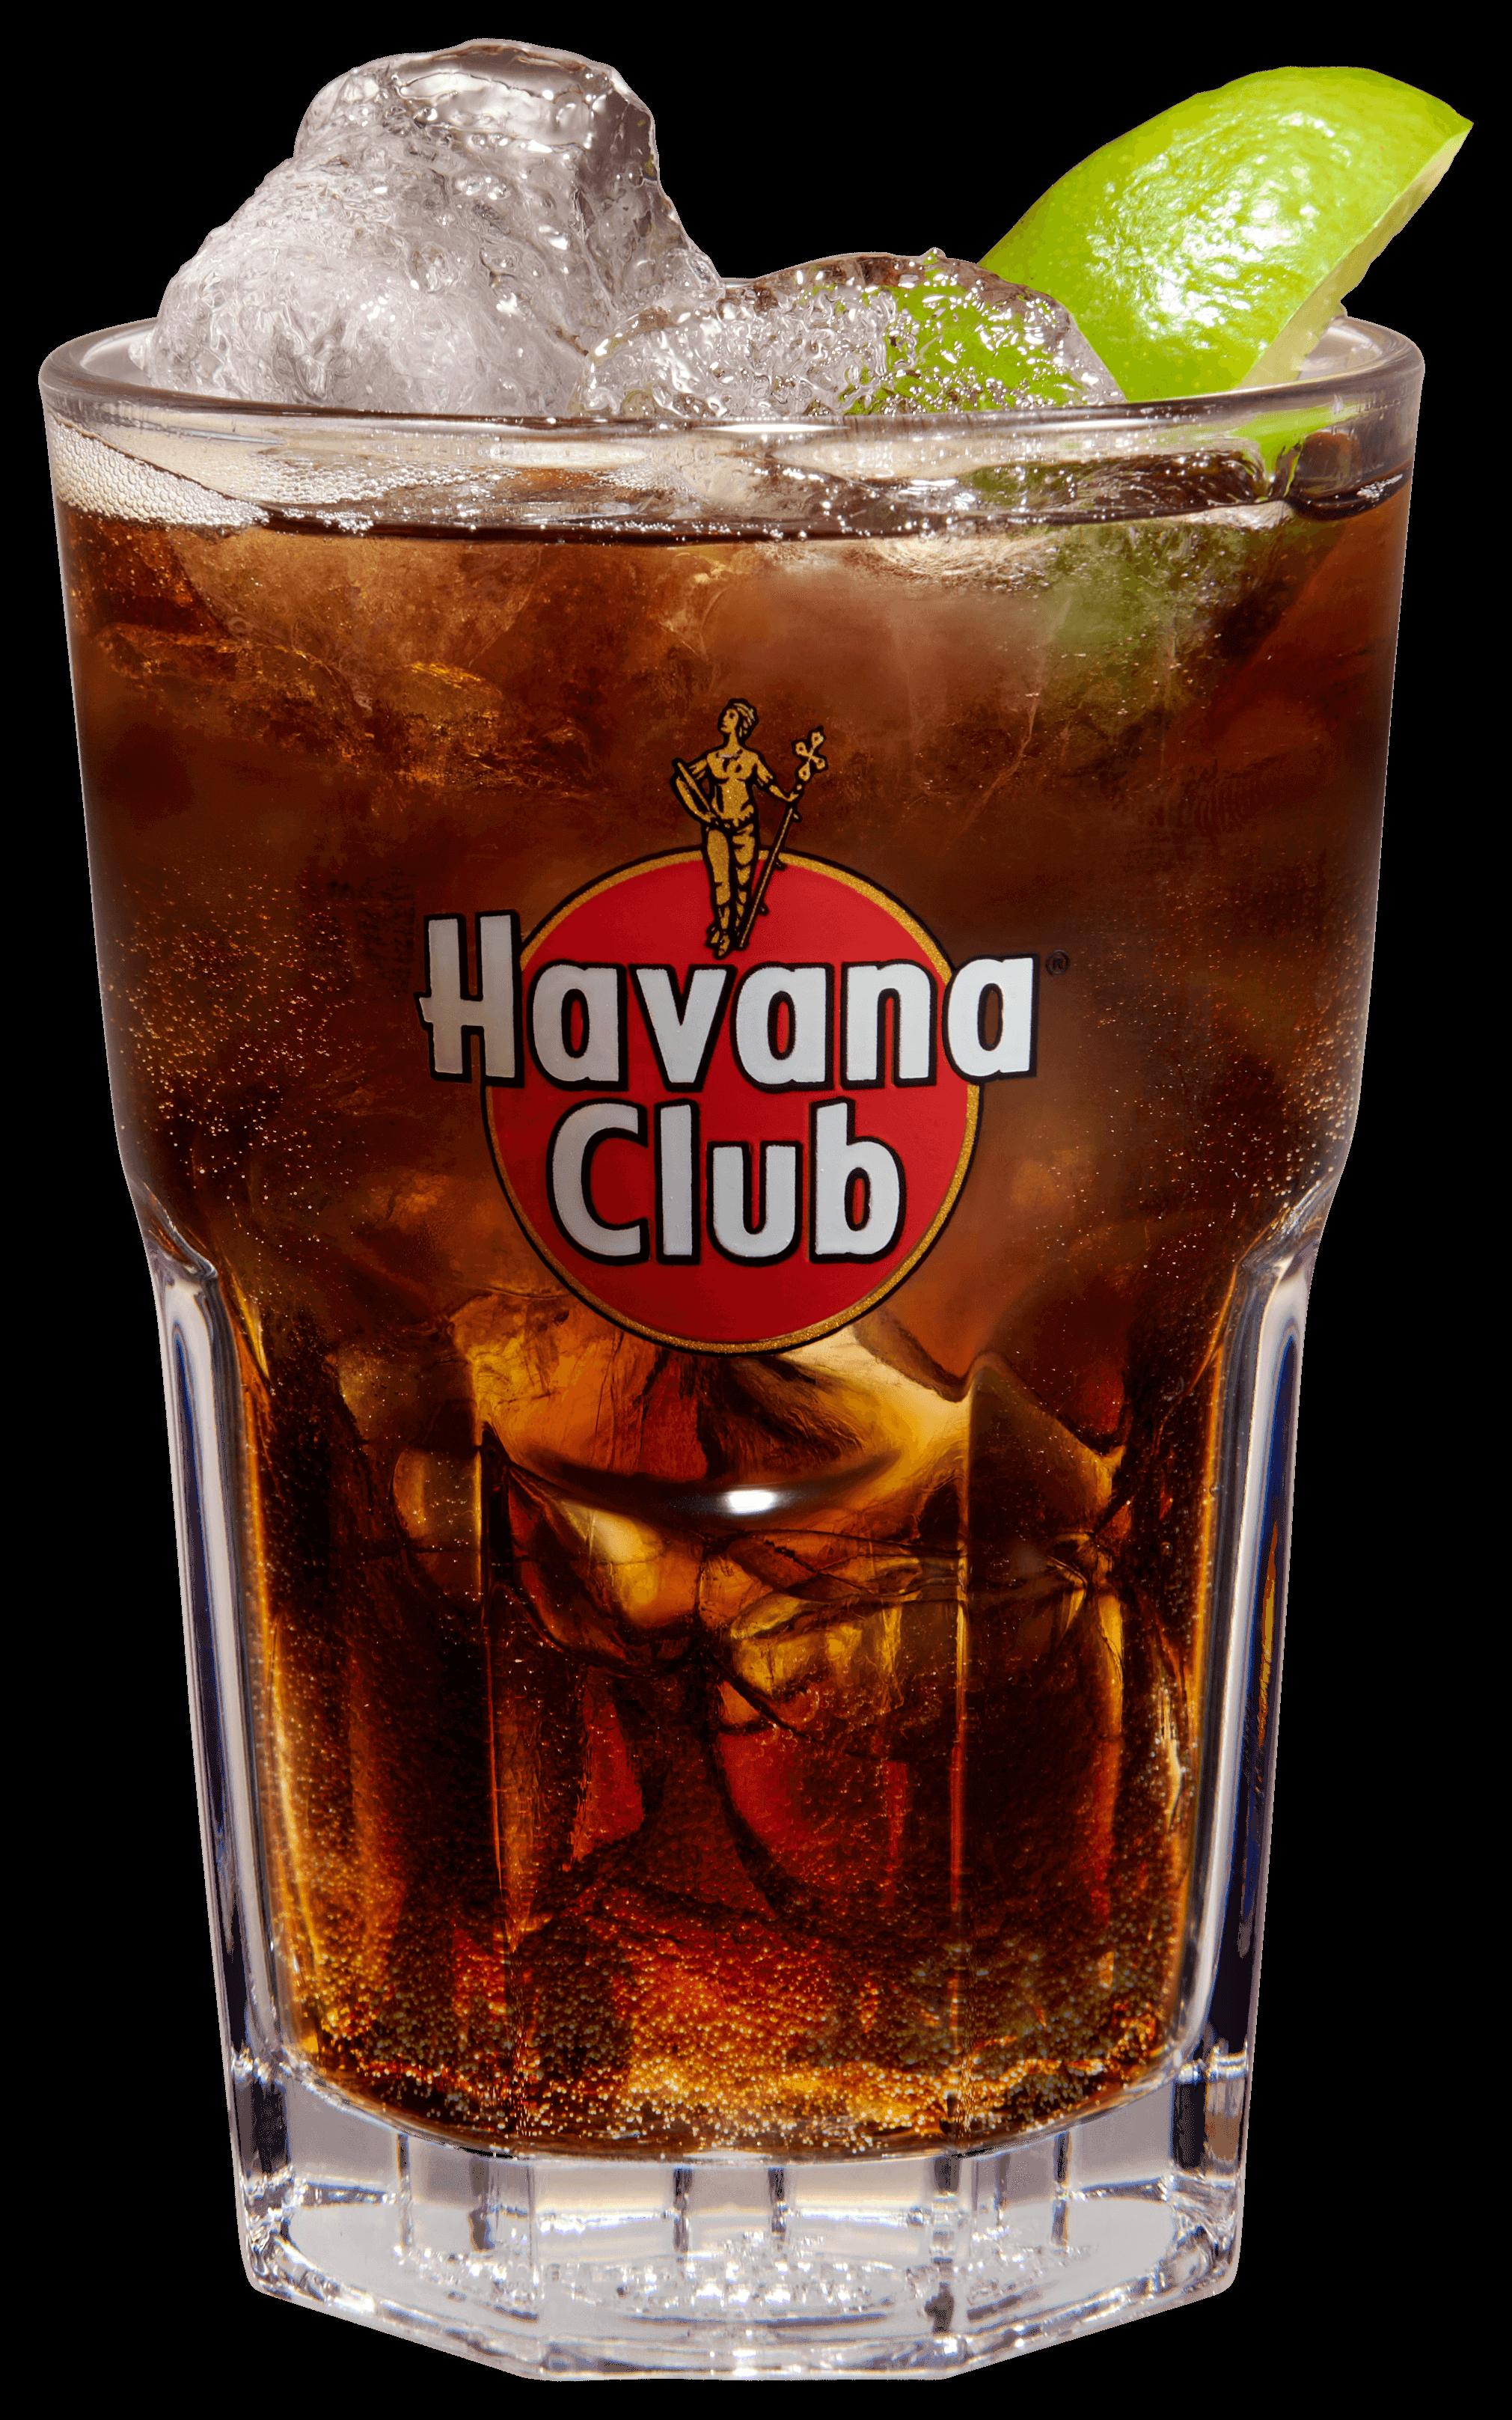 Cuba, que linda es cuba... - Página 3 11_HCE_CUBALIBRE_0127_BASE